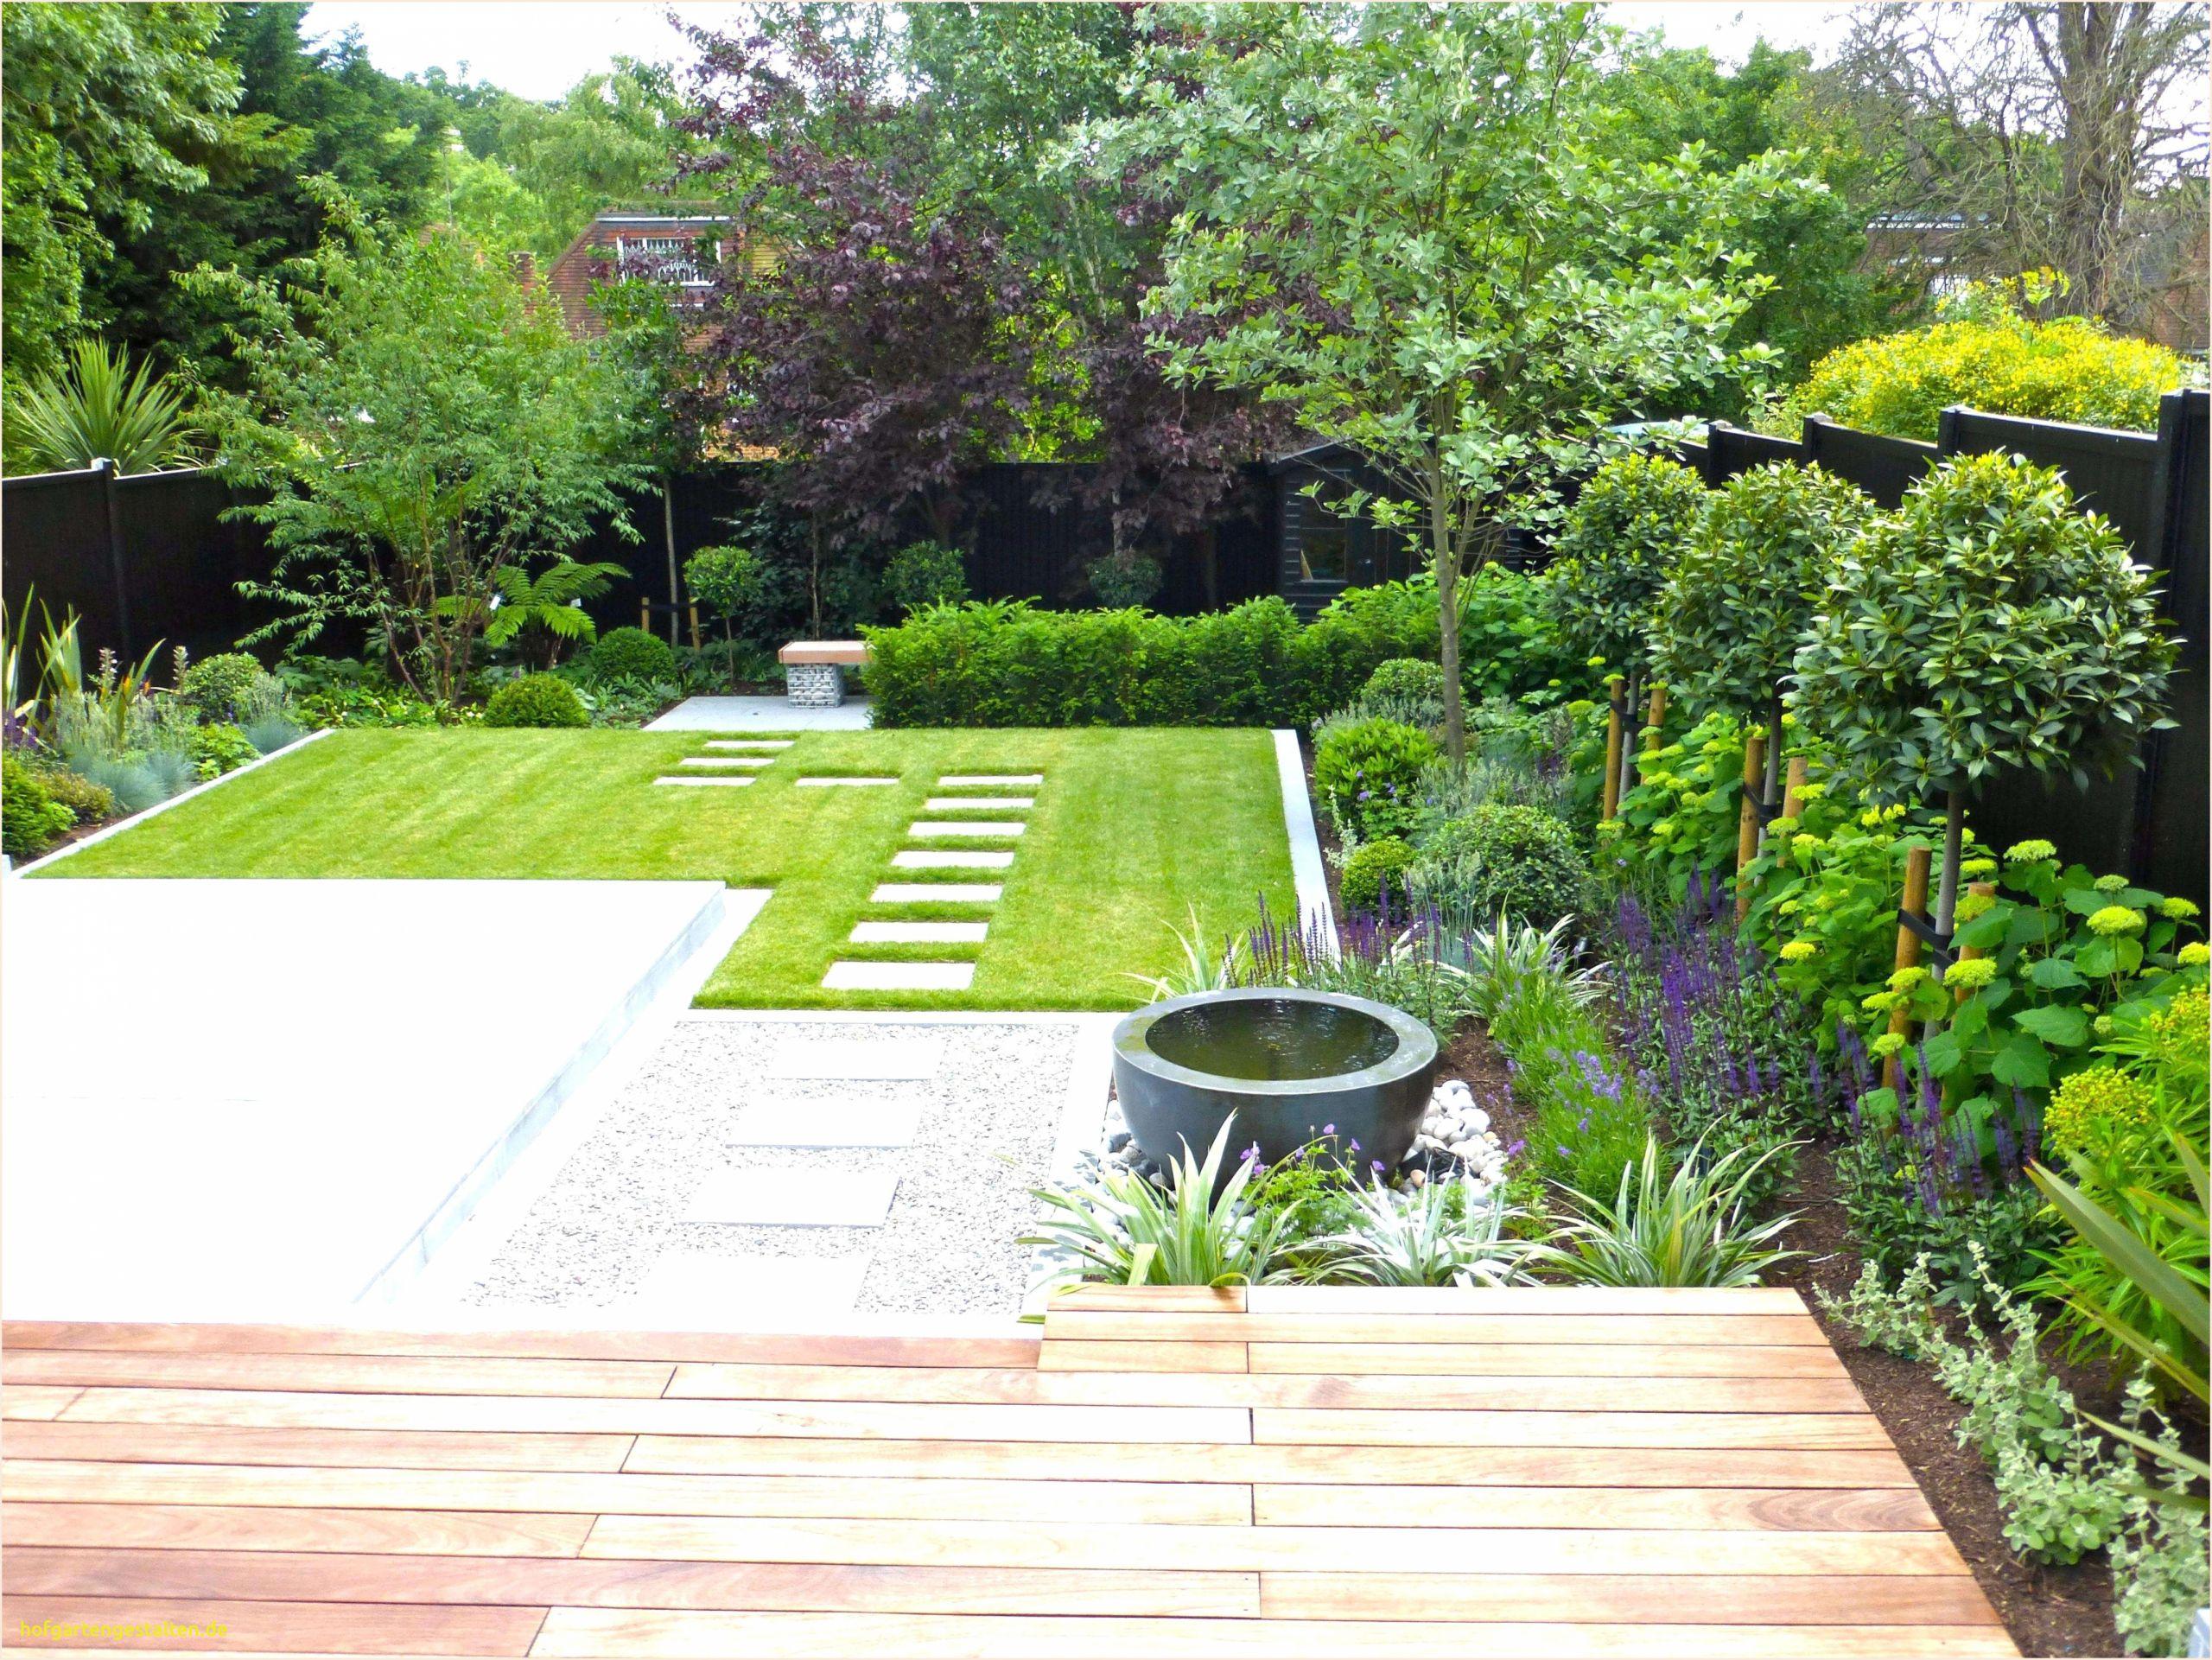 Deko Ideen Aus Holz Selber Machen Best Of Deko Garten Selber Machen — Temobardz Home Blog